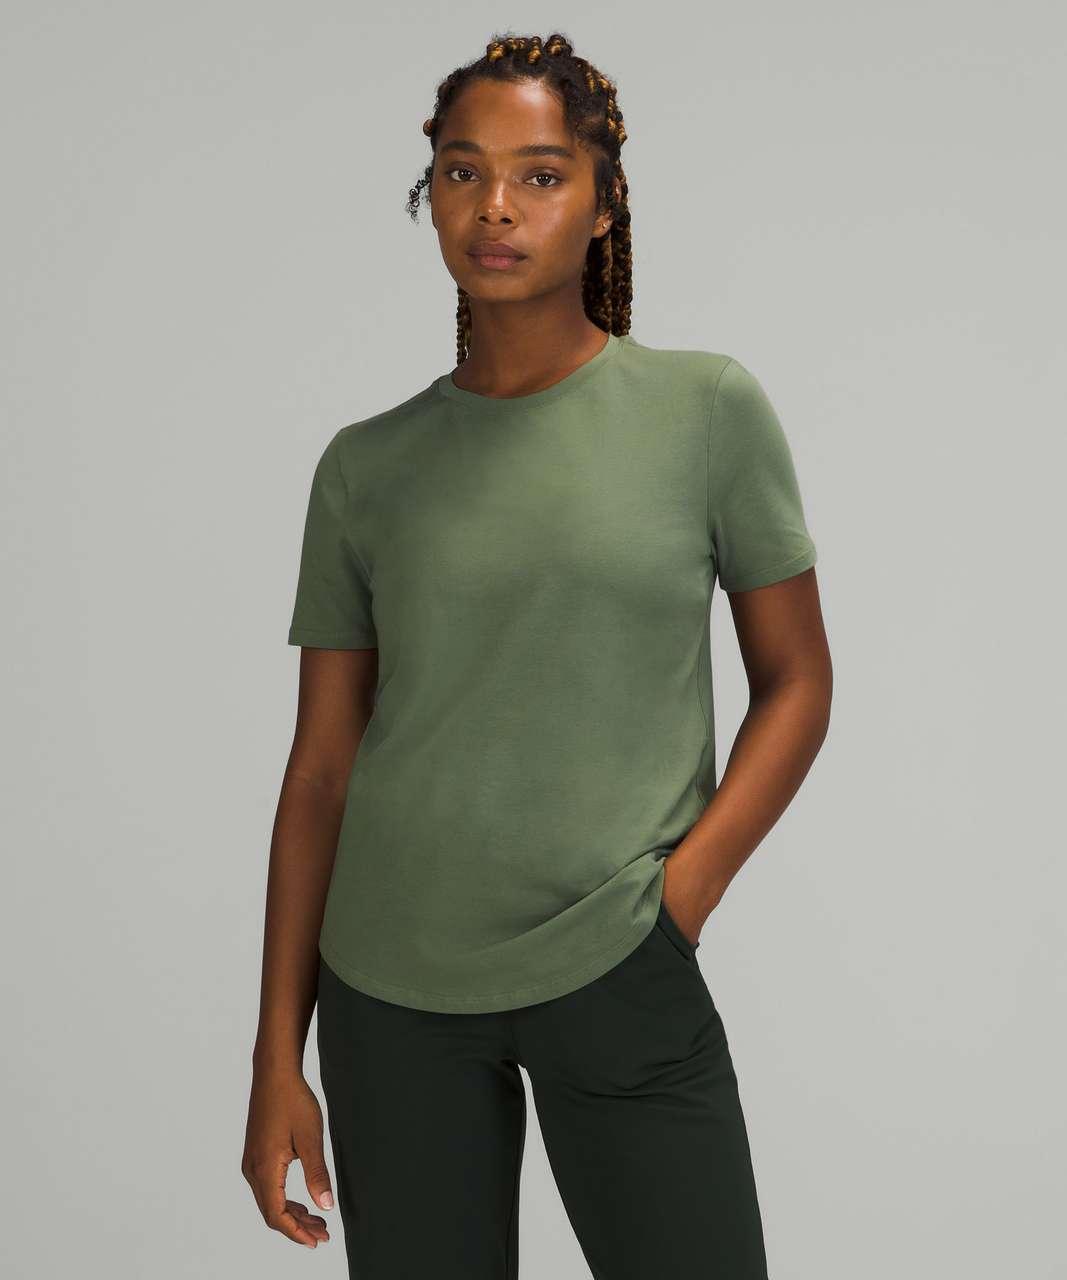 Lululemon Love Crew Short Sleeve T-Shirt - Green Twill